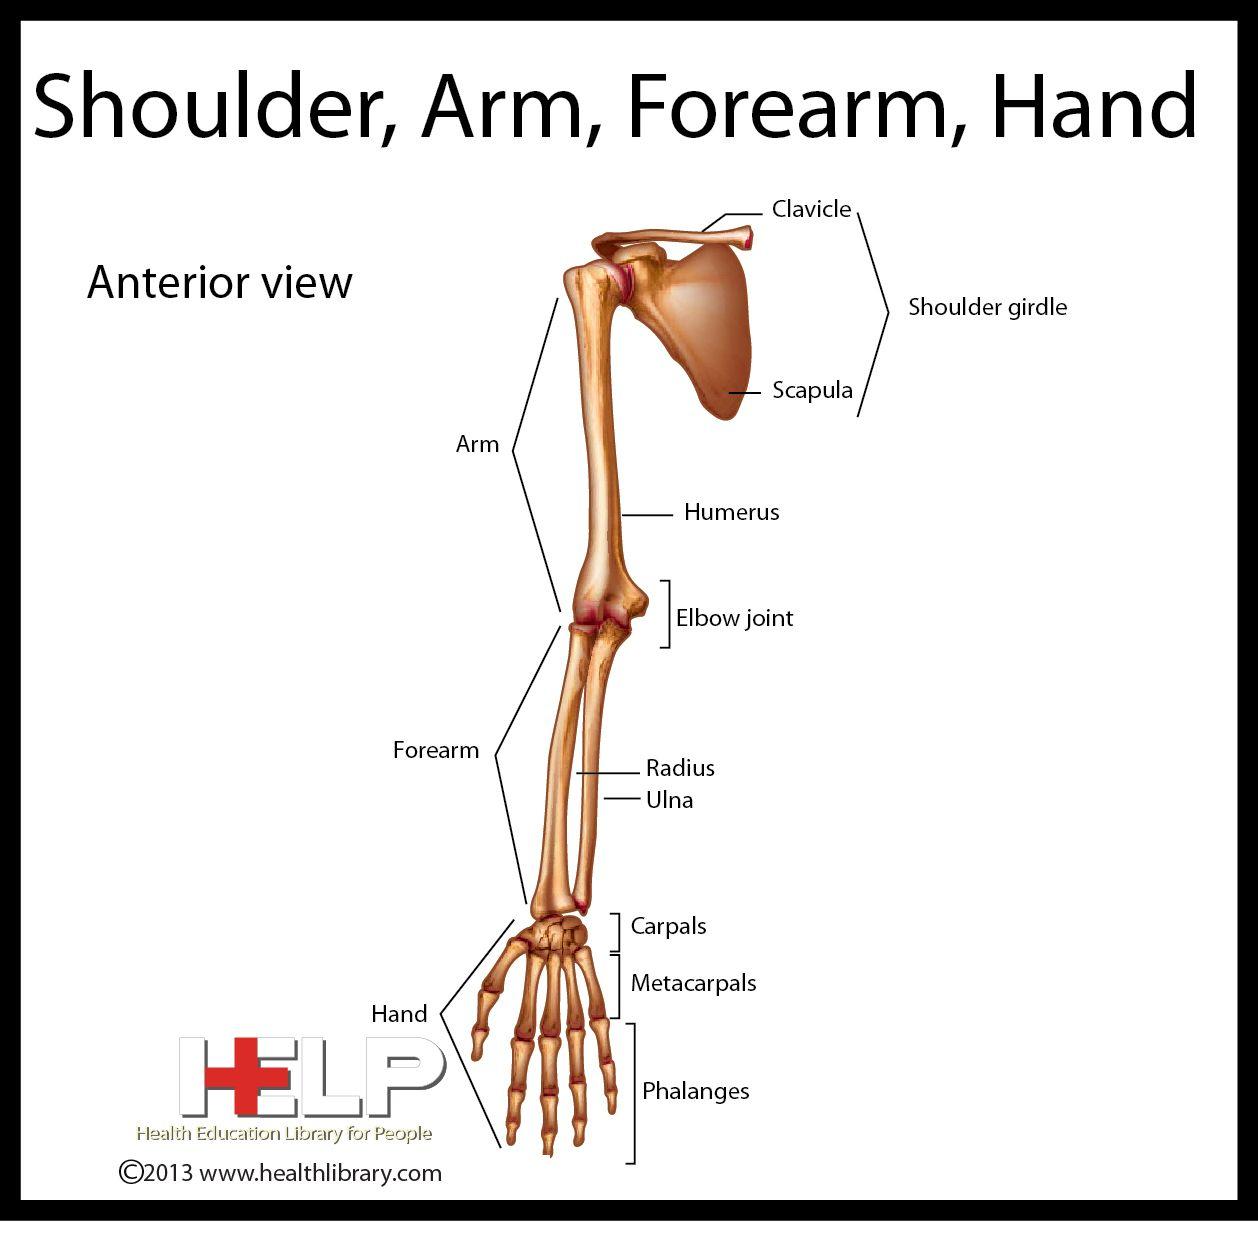 Shoulder Arm Forearm Hand